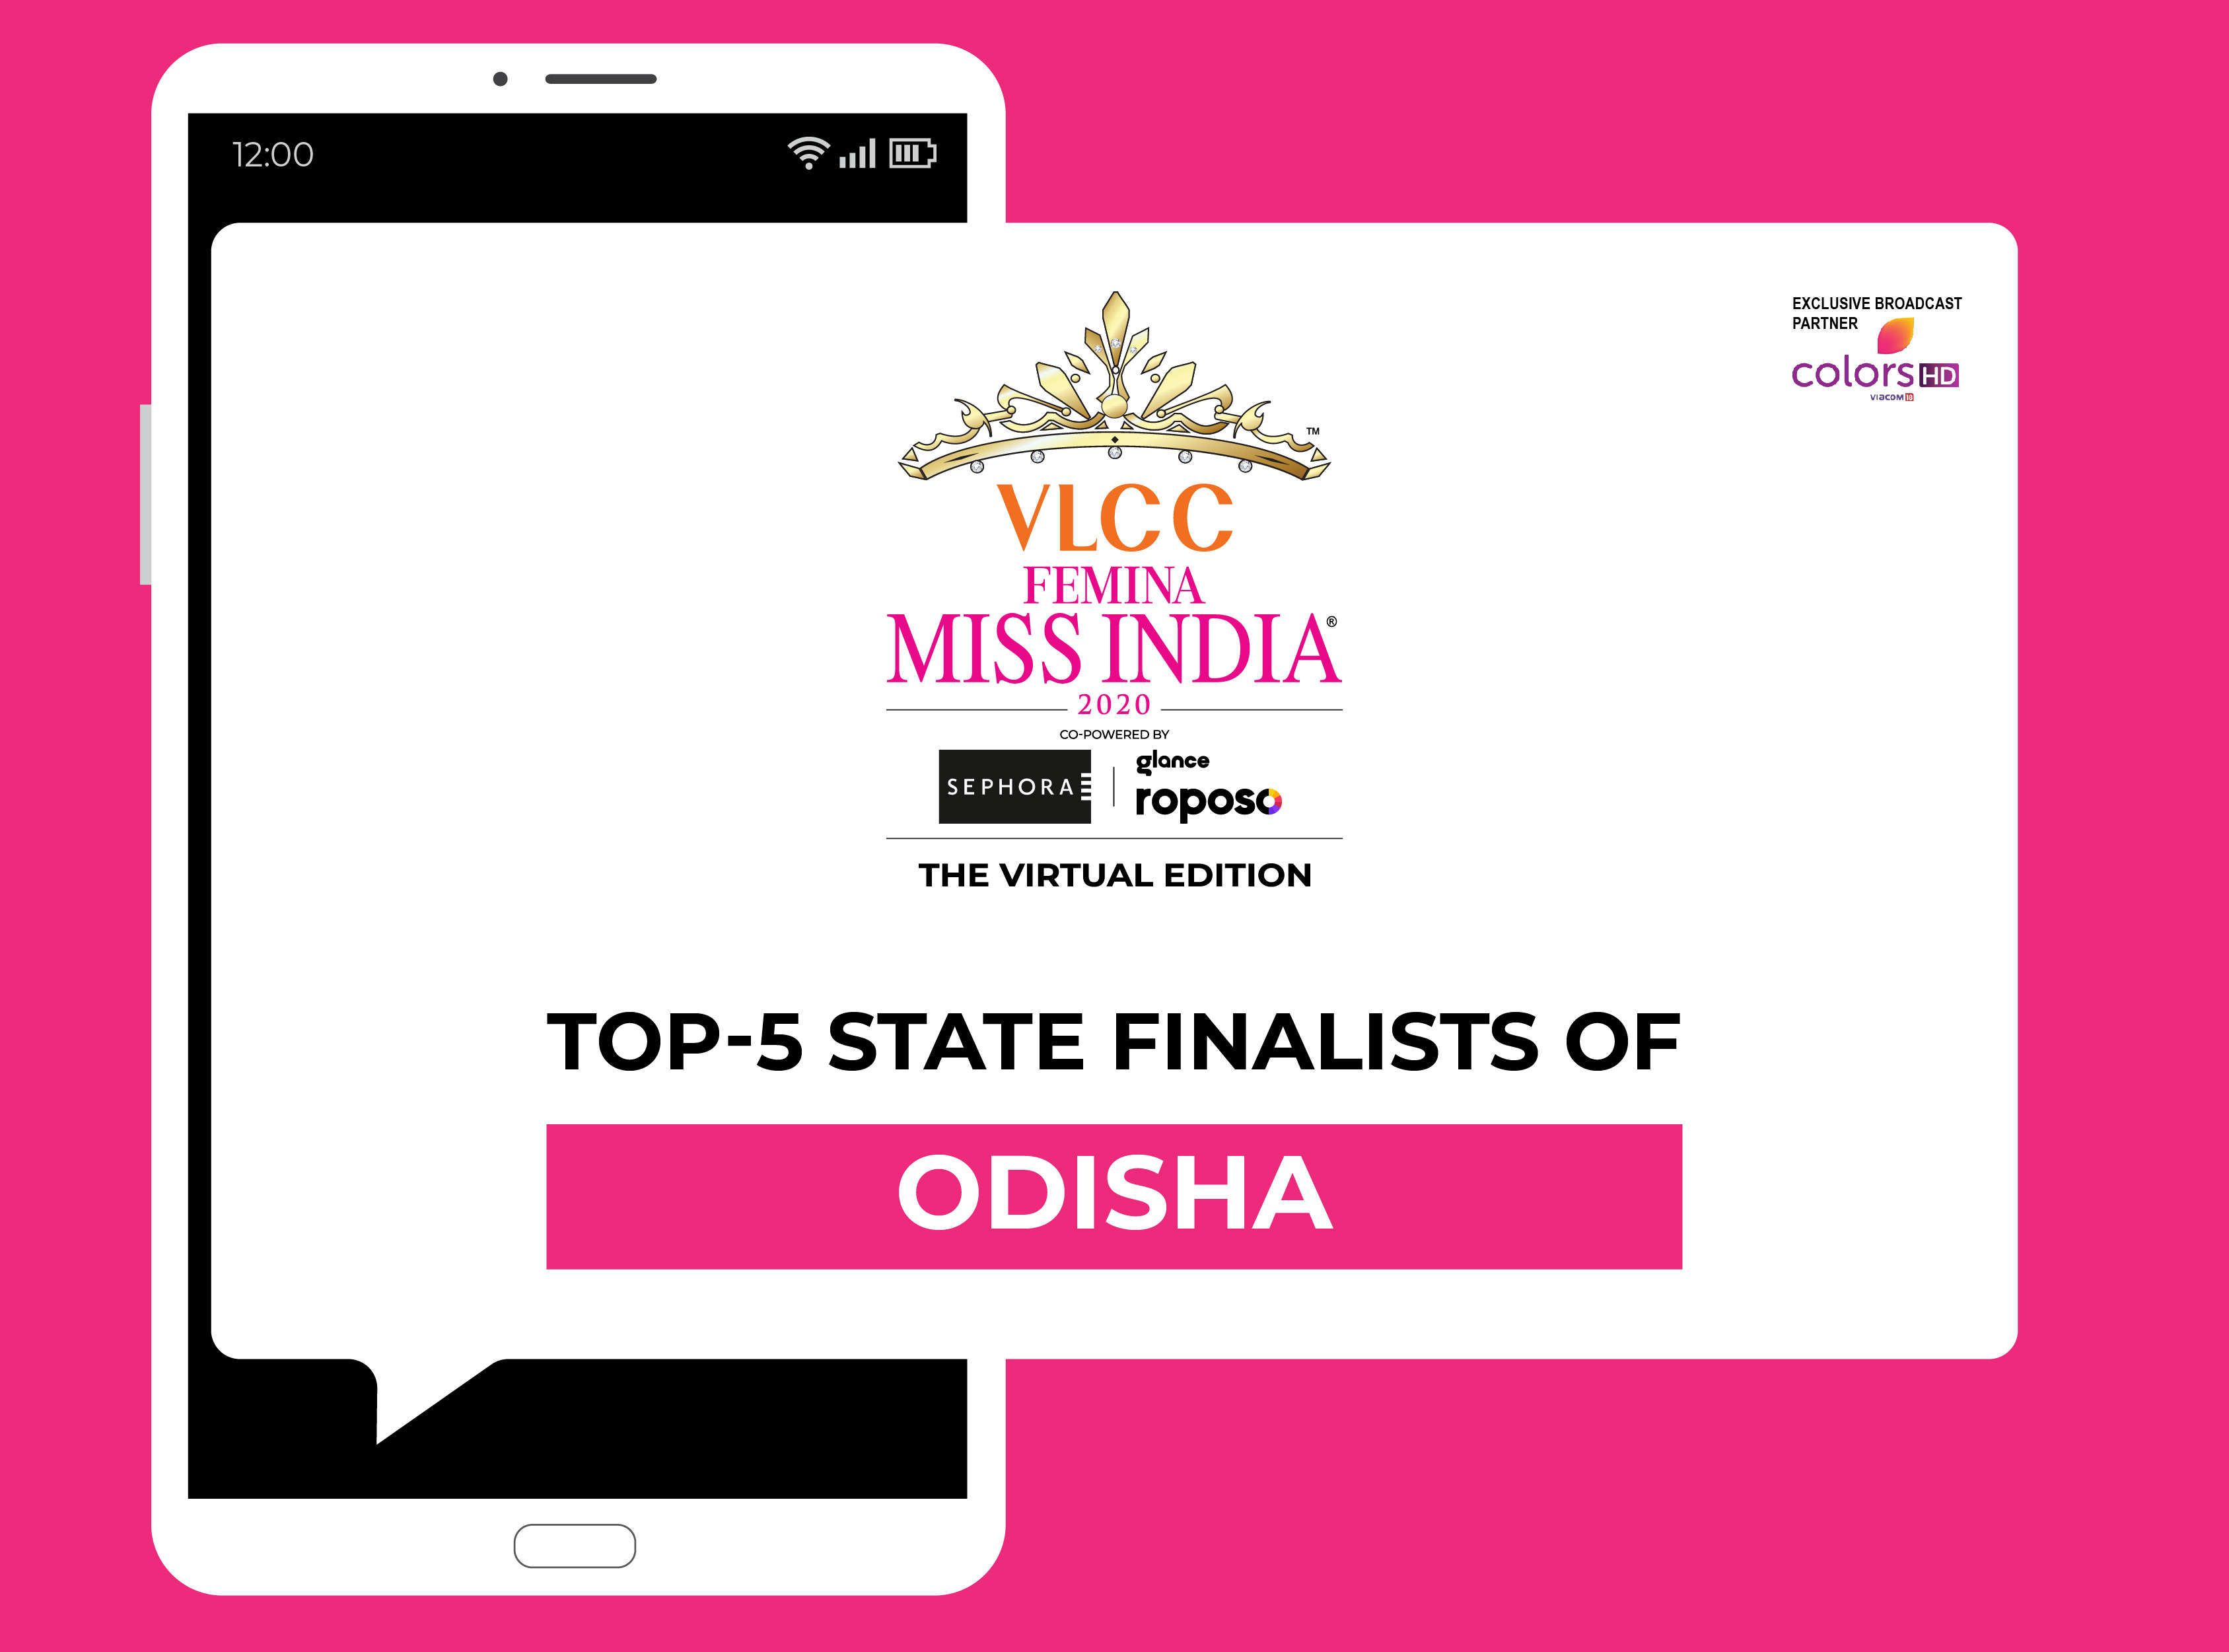 Introducing VLCC Femina Miss India Odisha 2020 Finalists!